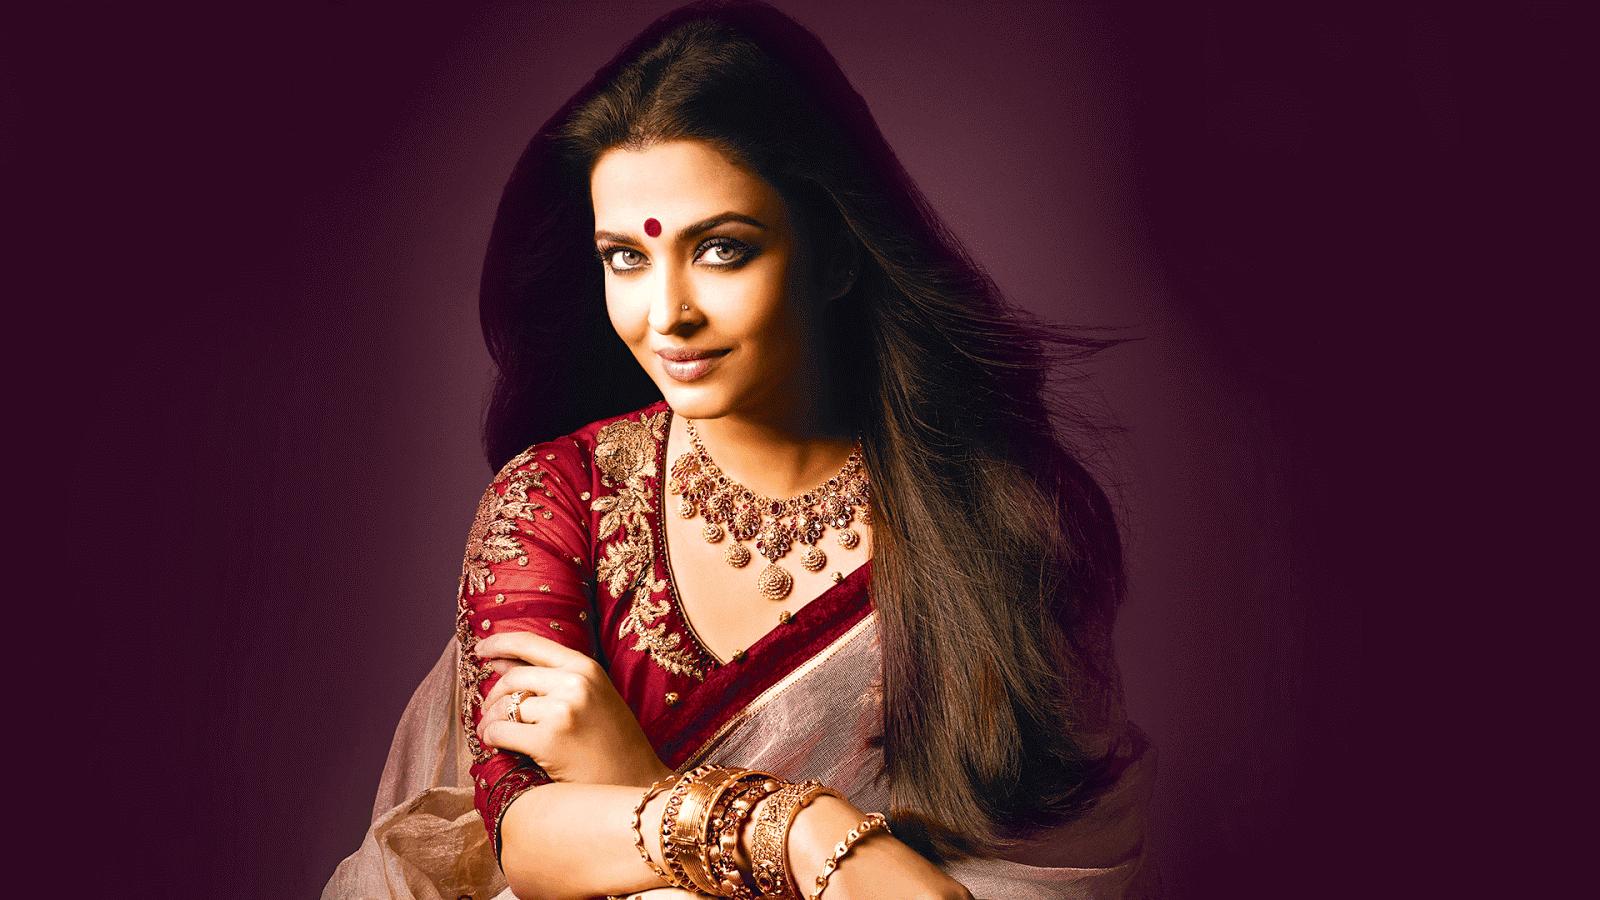 Aishwarya rai nude photo hd-2550